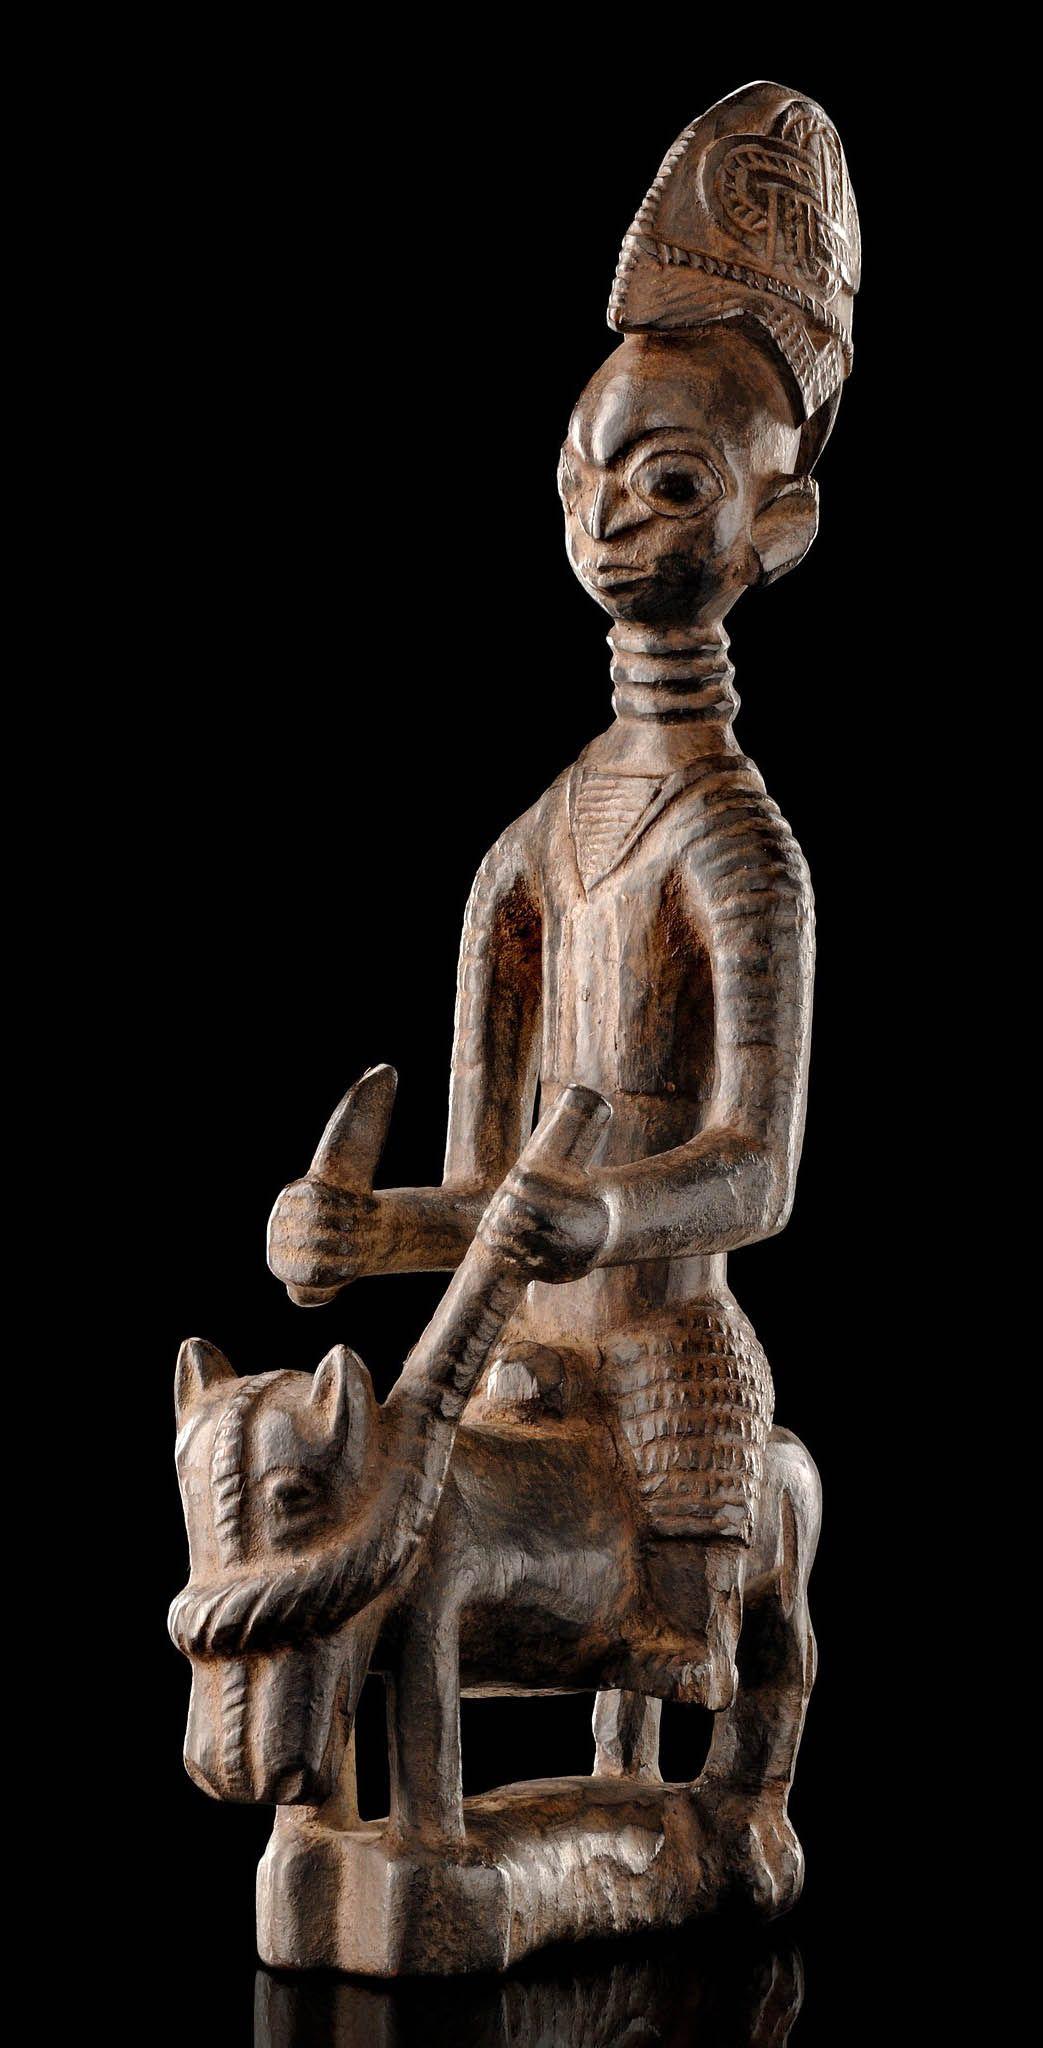 Africa Equestrian figure from the Yoruba people of Nigeria Wood